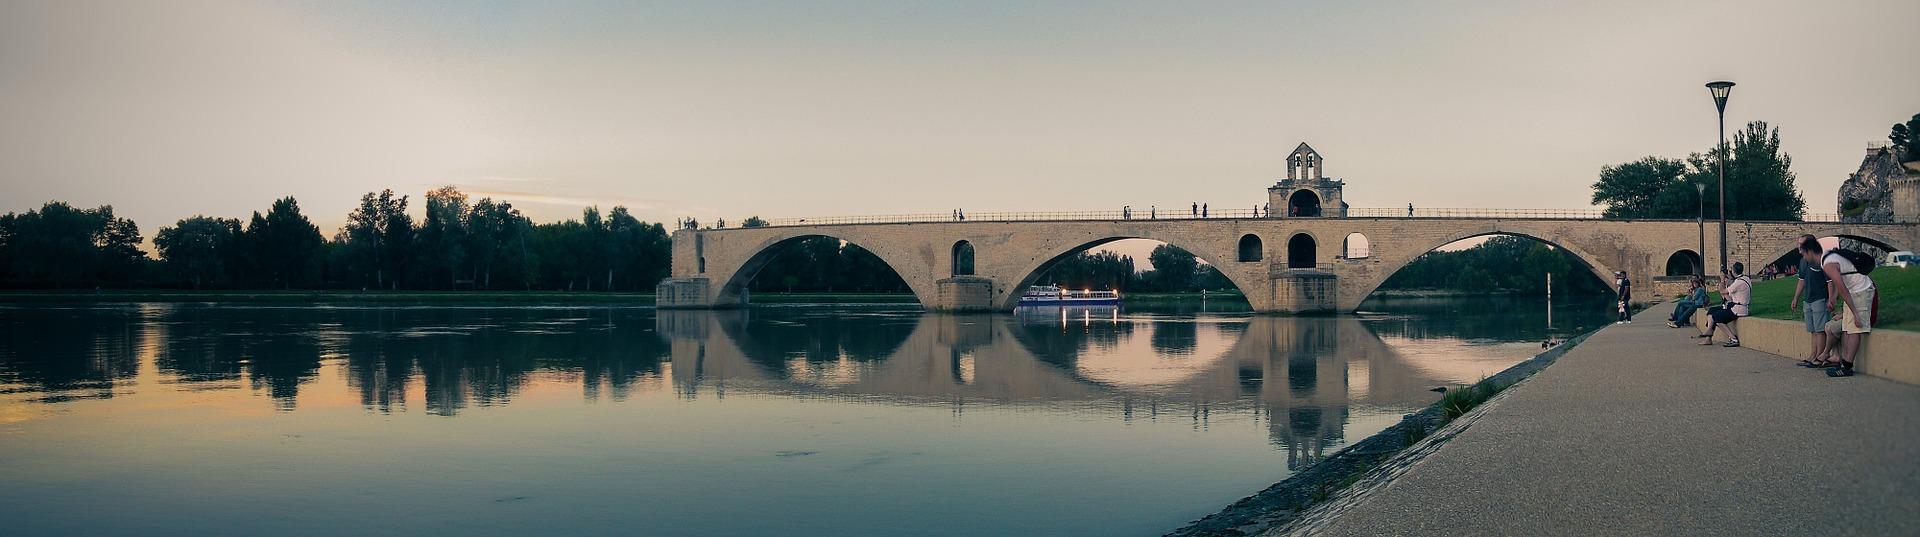 Viager à Avignon